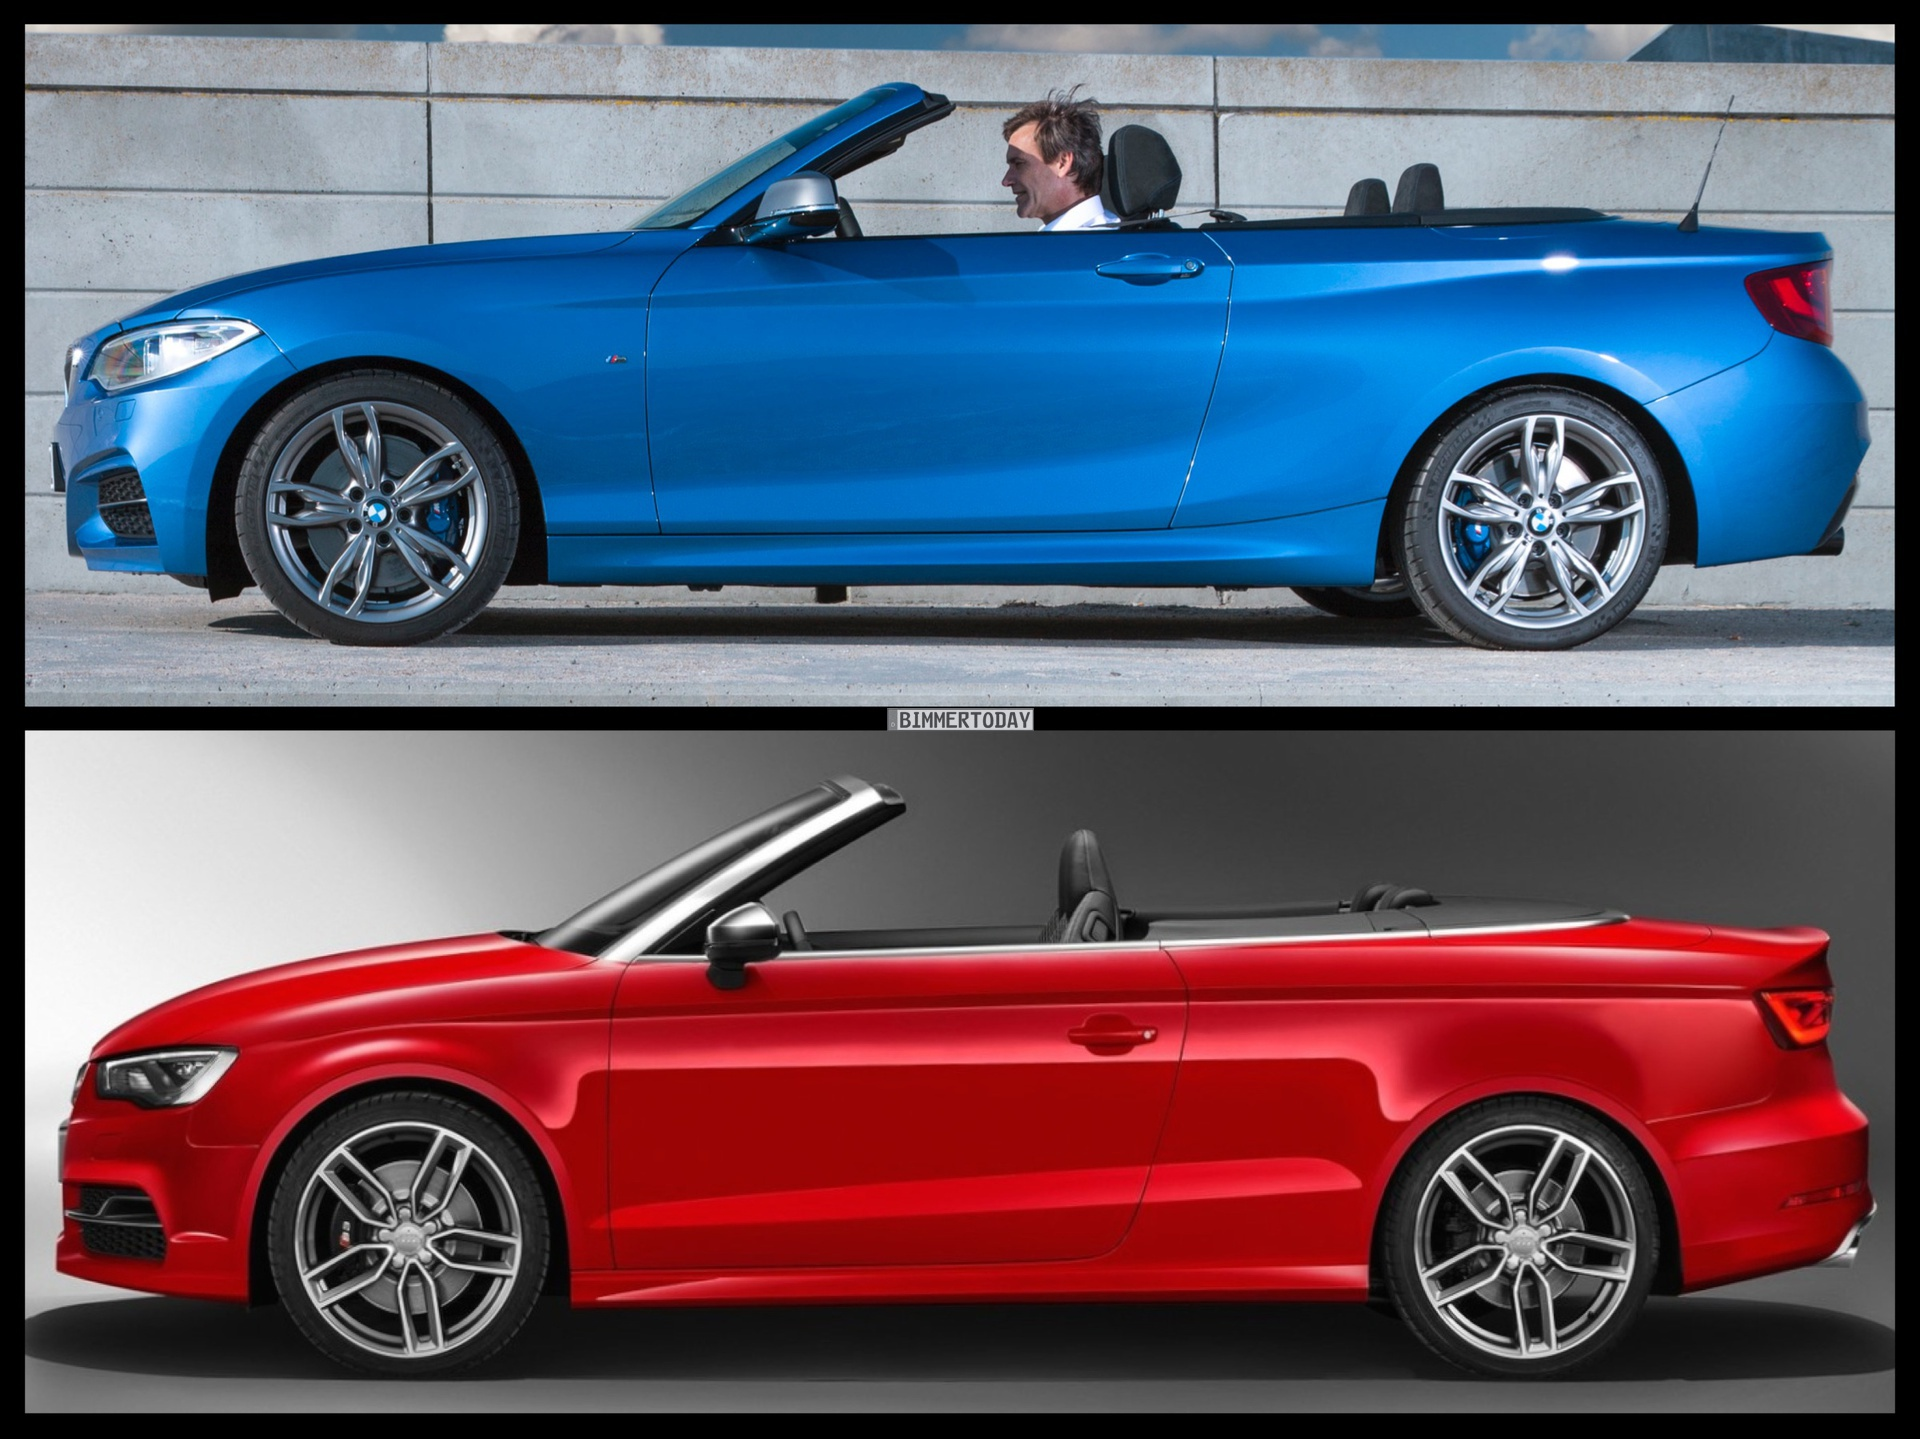 bmw 2 series convertible vs audi a3 convertible specs comparison. Black Bedroom Furniture Sets. Home Design Ideas